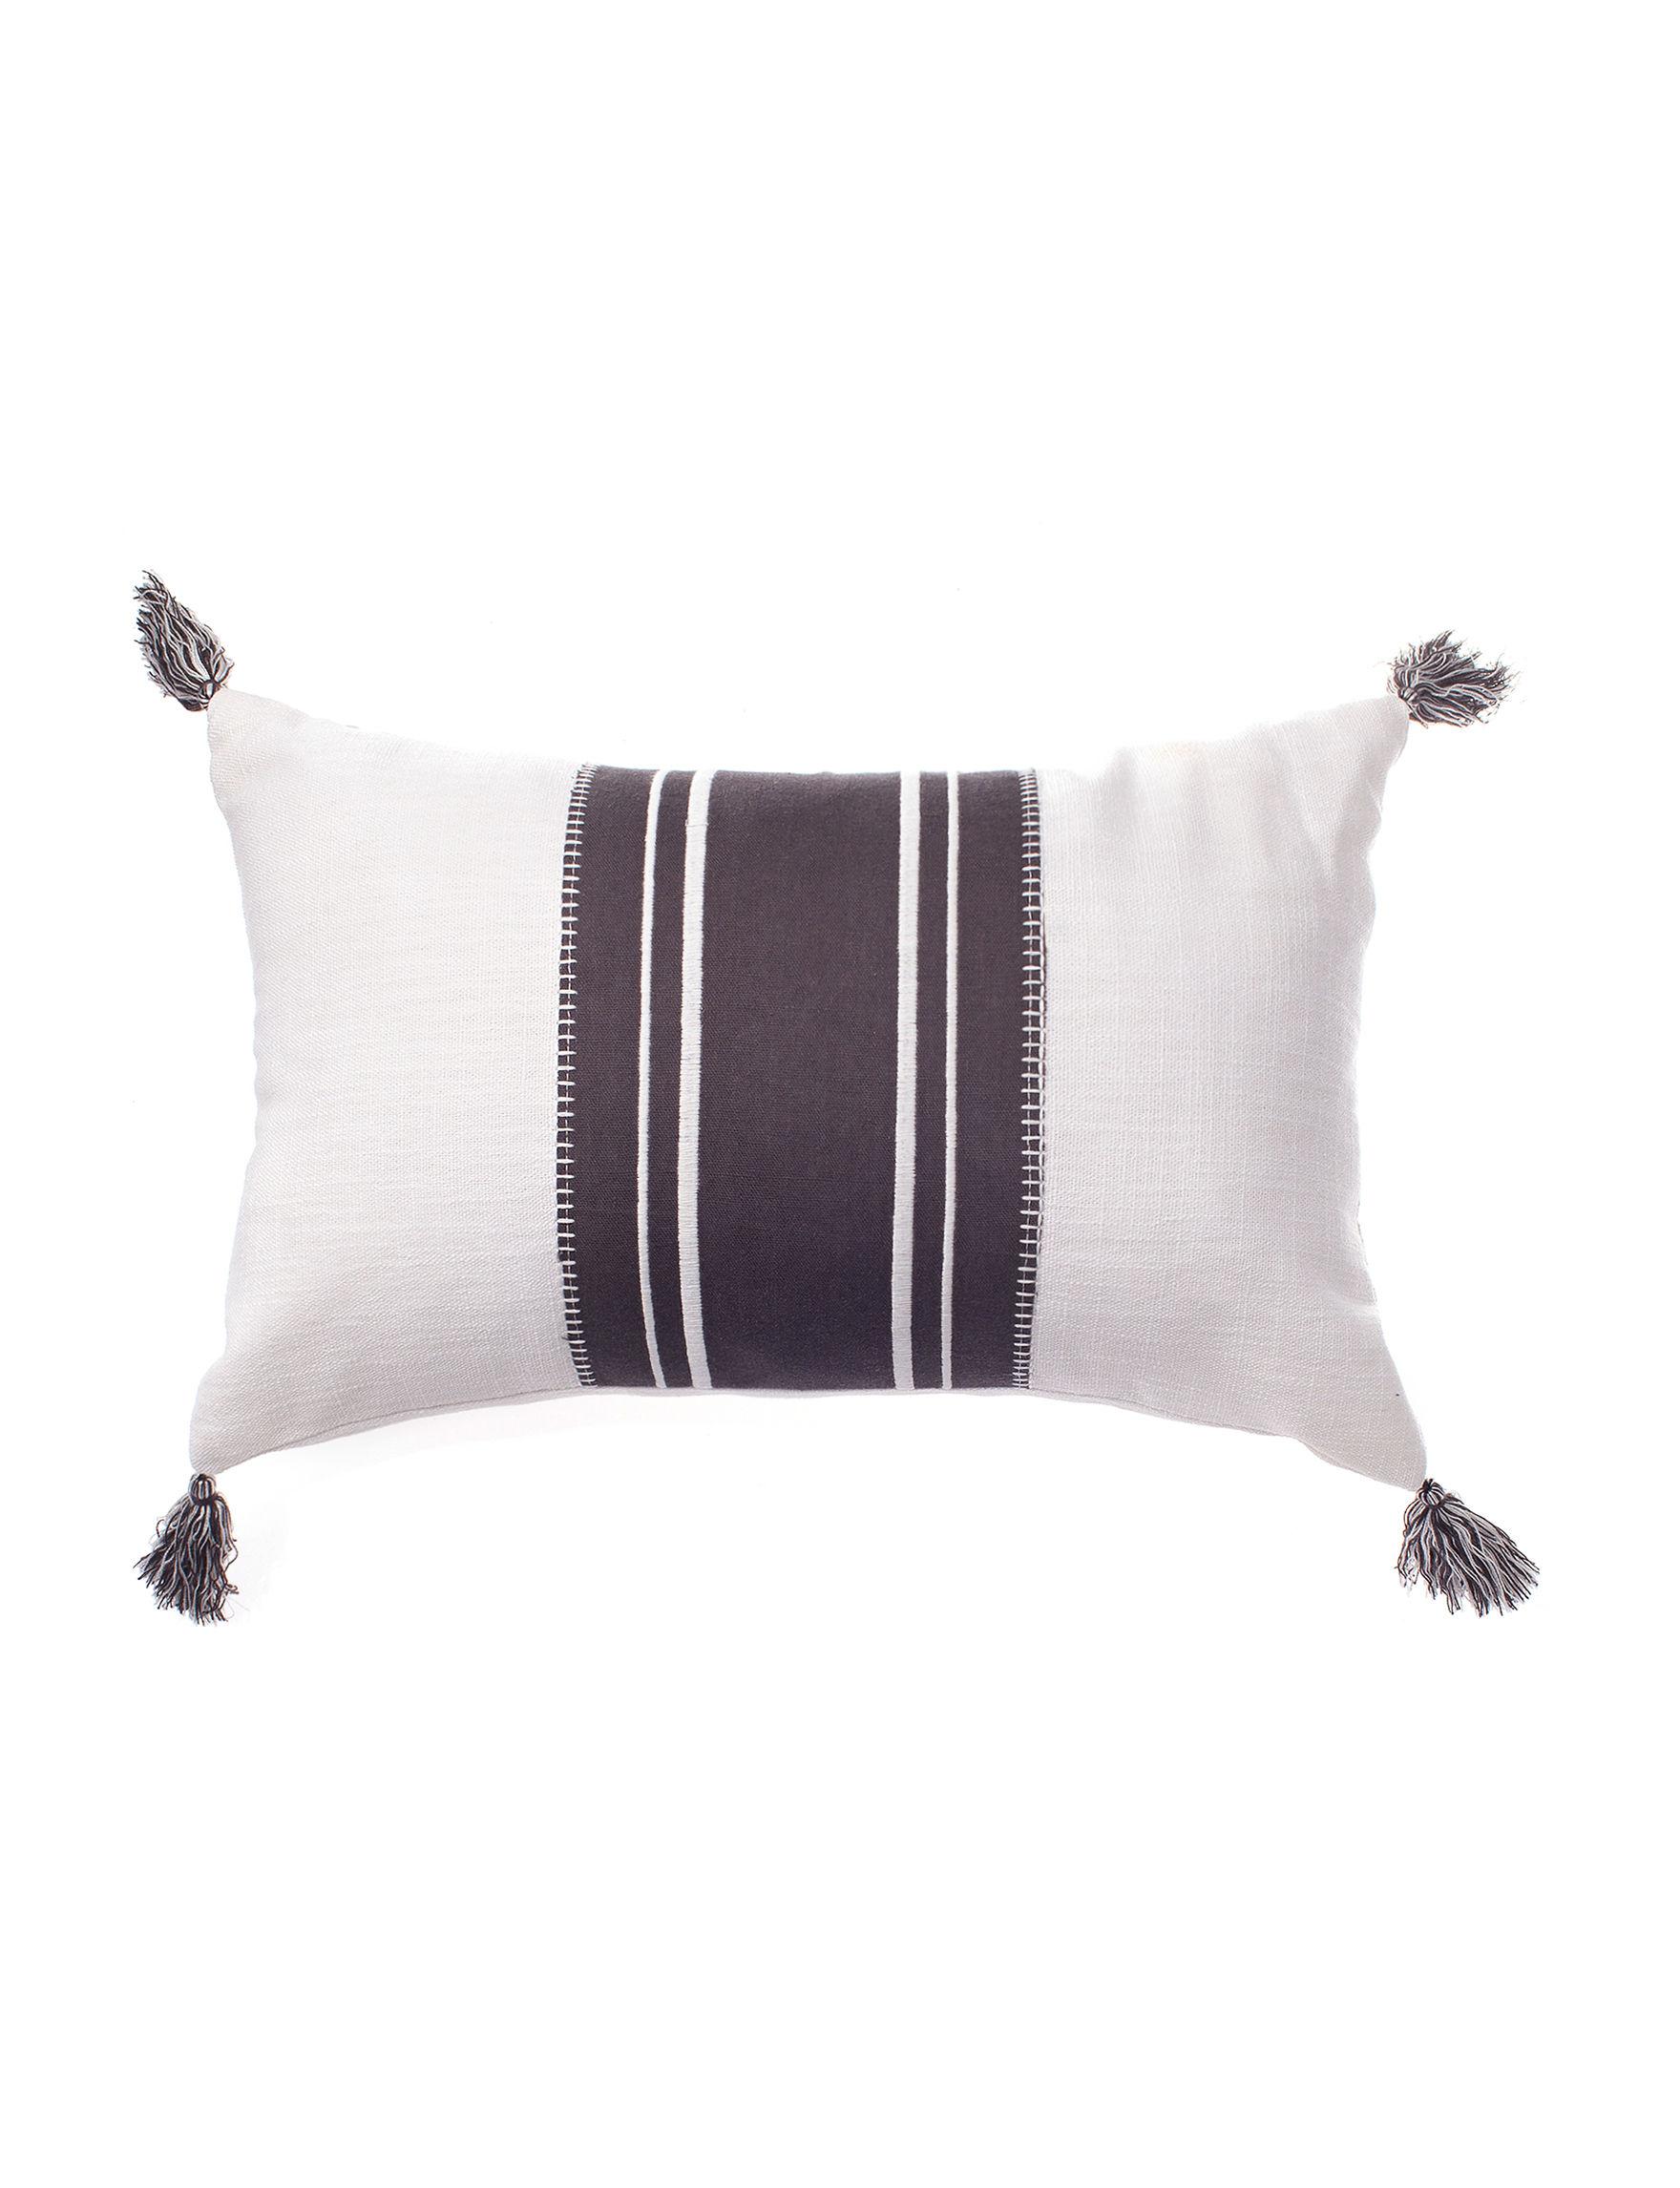 Deco Grey / White Decorative Pillows